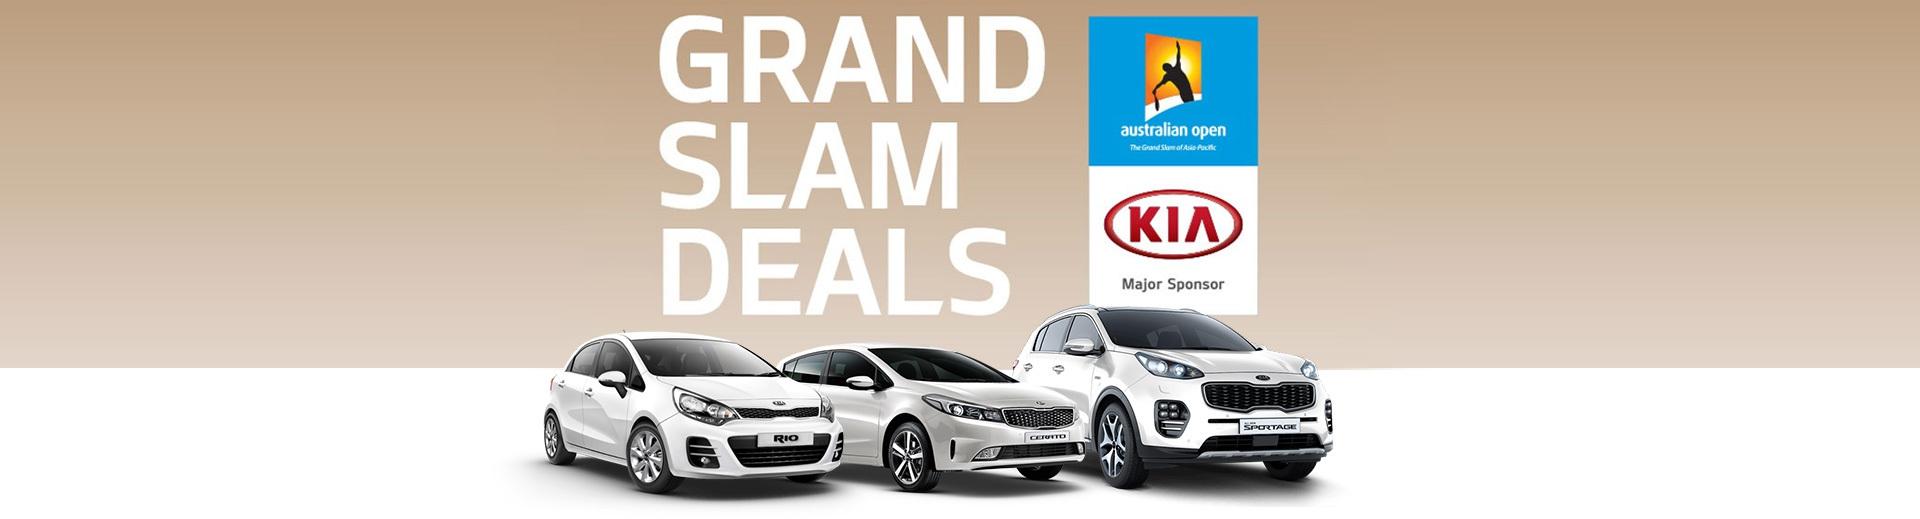 Kia National Offer - Grand Slam Deals